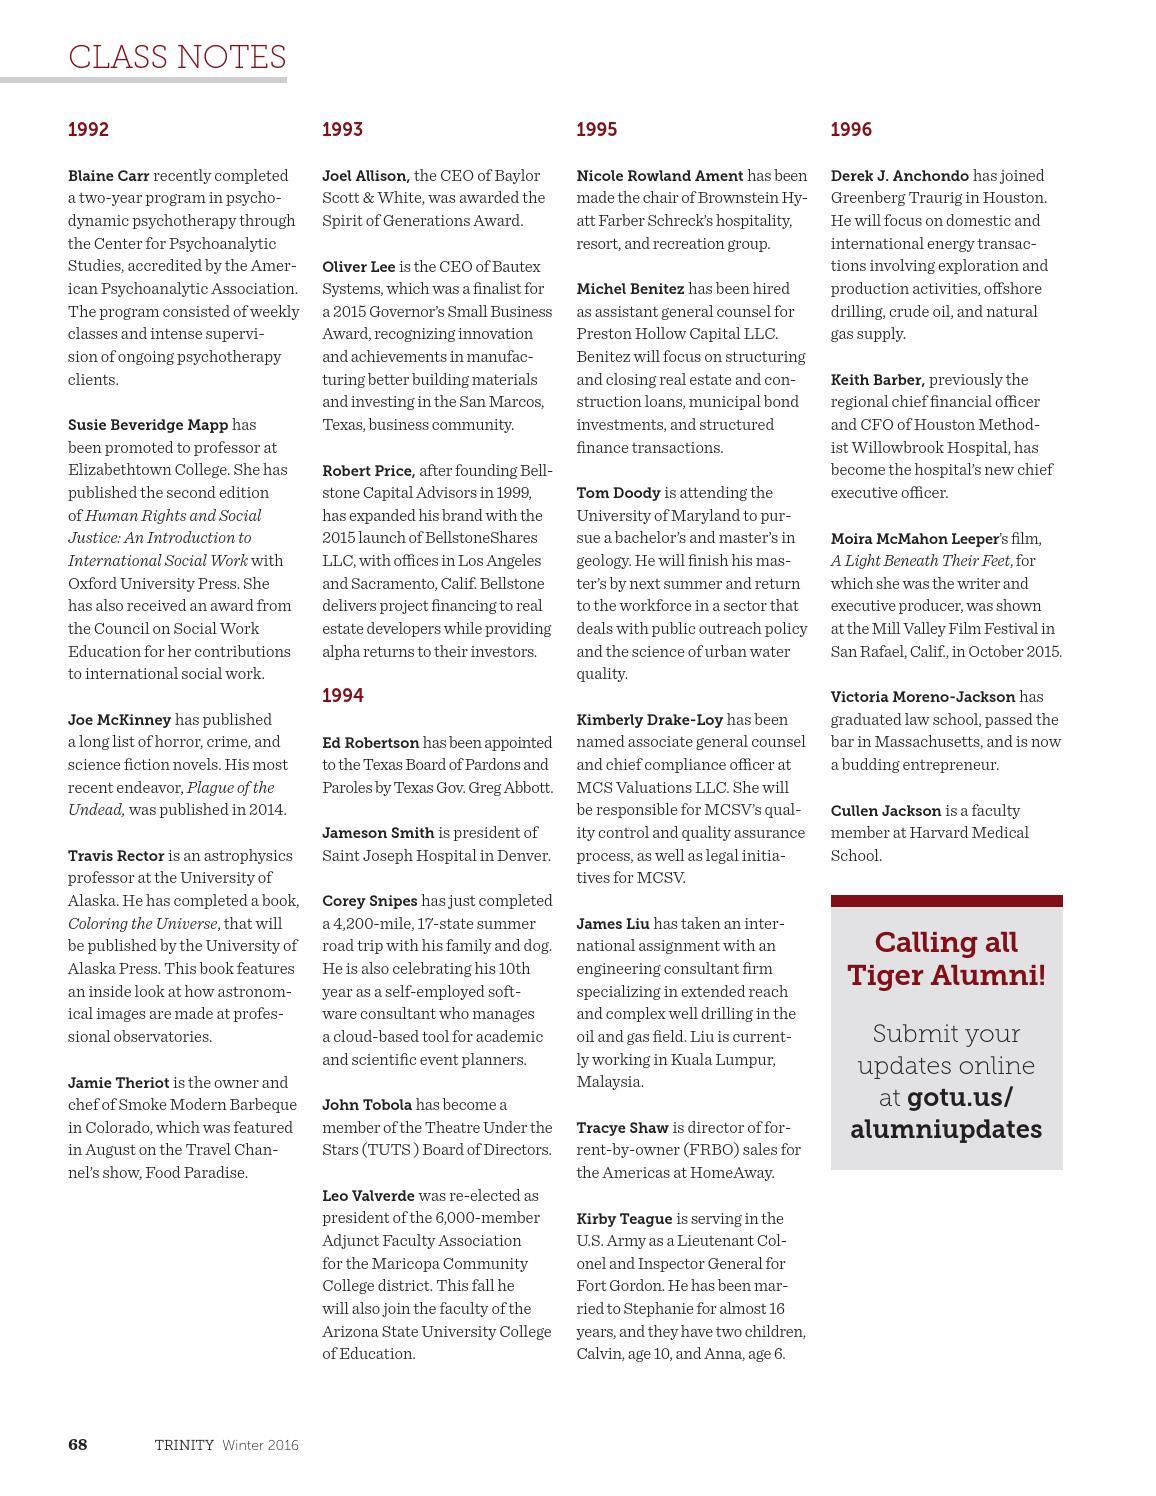 Trinity Magazine | Winter 2016 by Trinity University - issuu